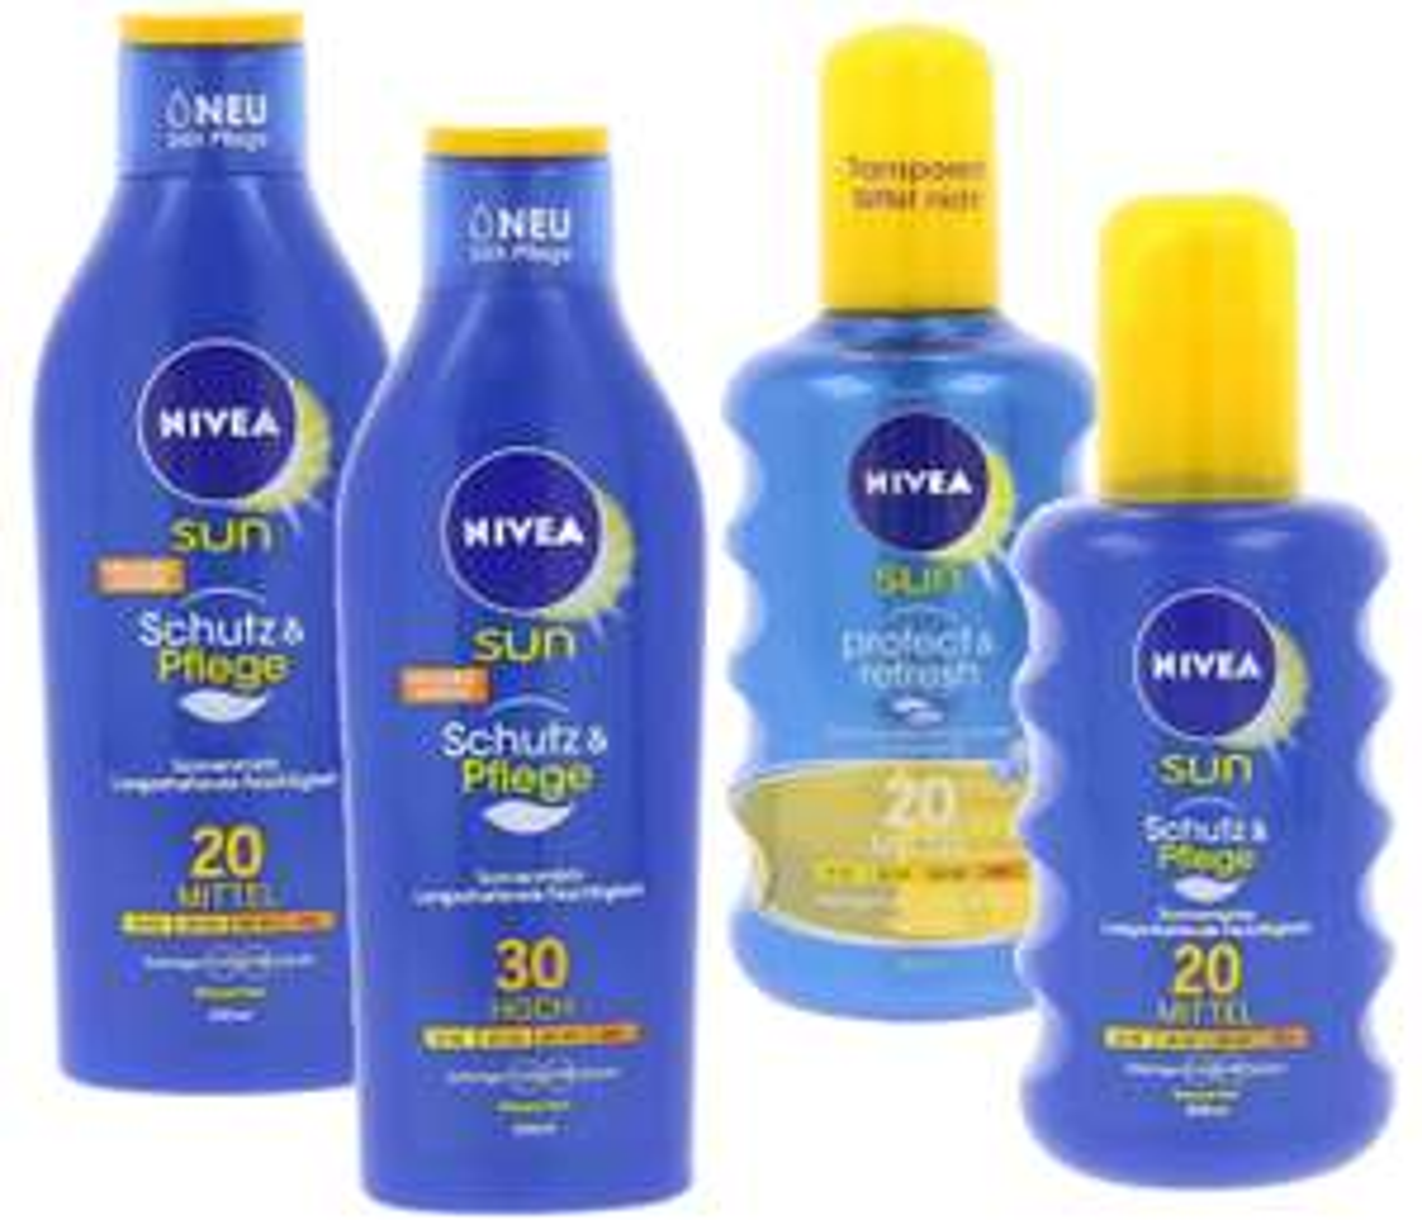 Nivea Sun Produkte für 3,99€ inkl. Versand